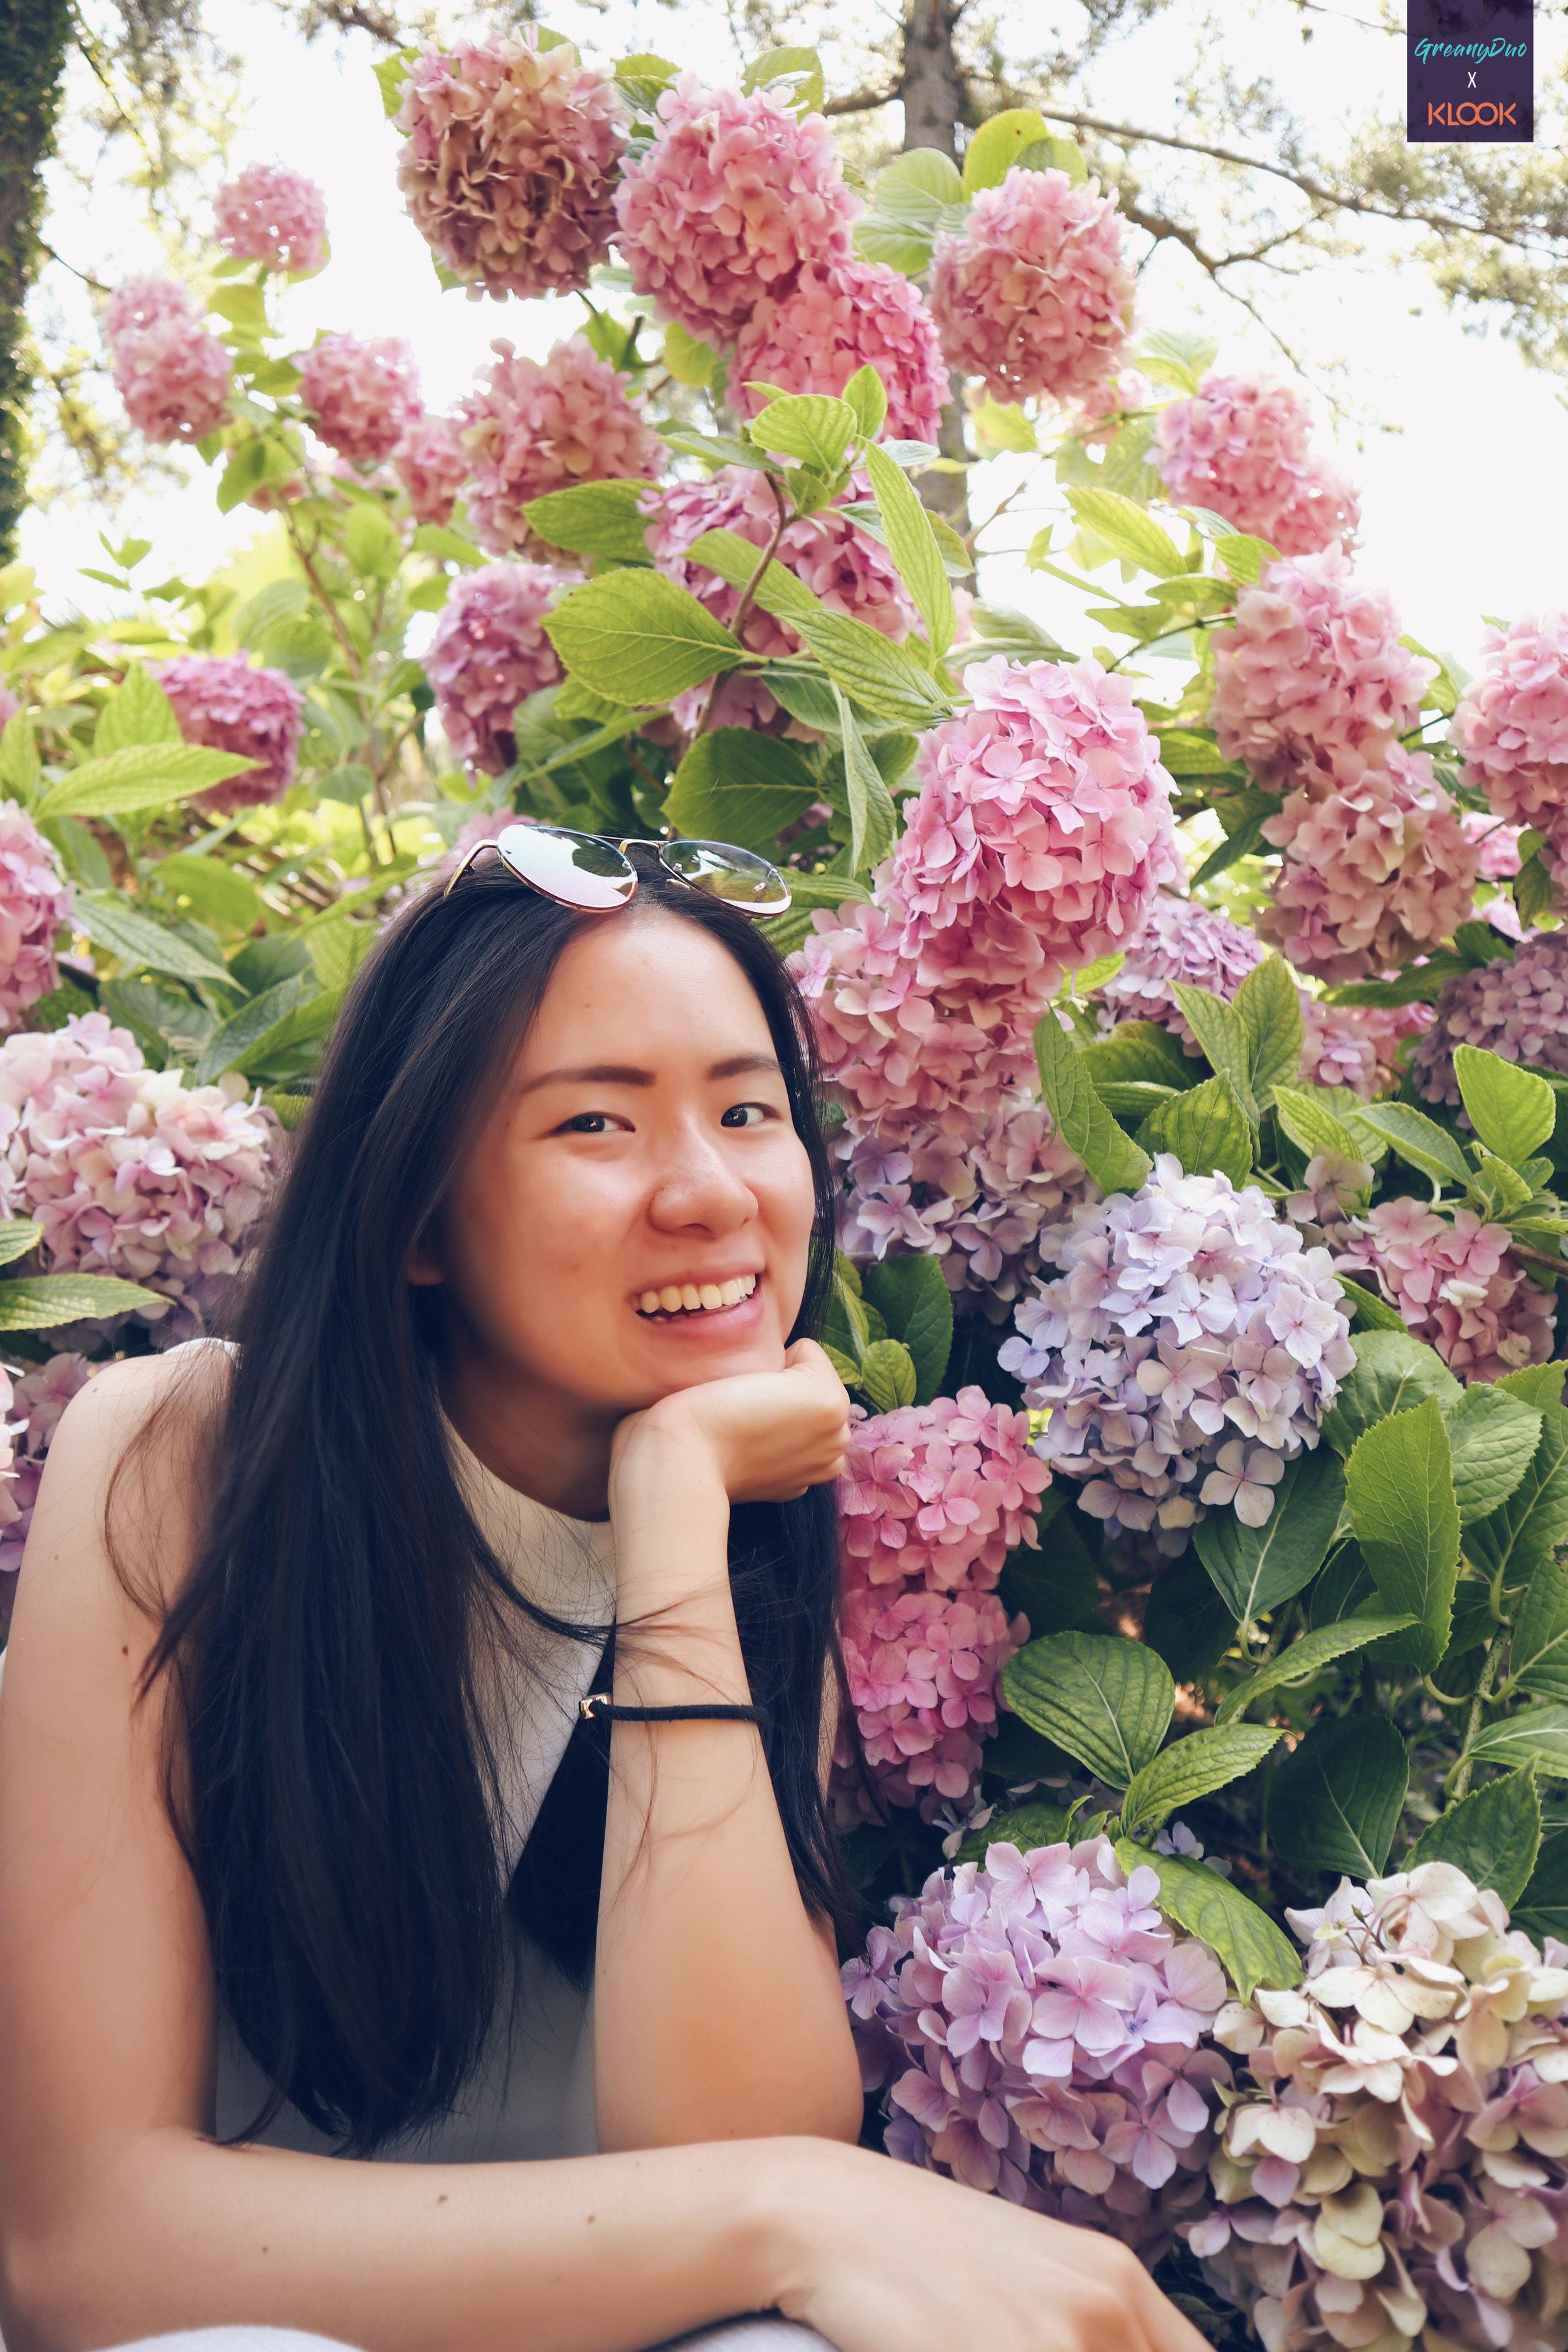 jenny posting with hydranges flower at hallim park, jeju